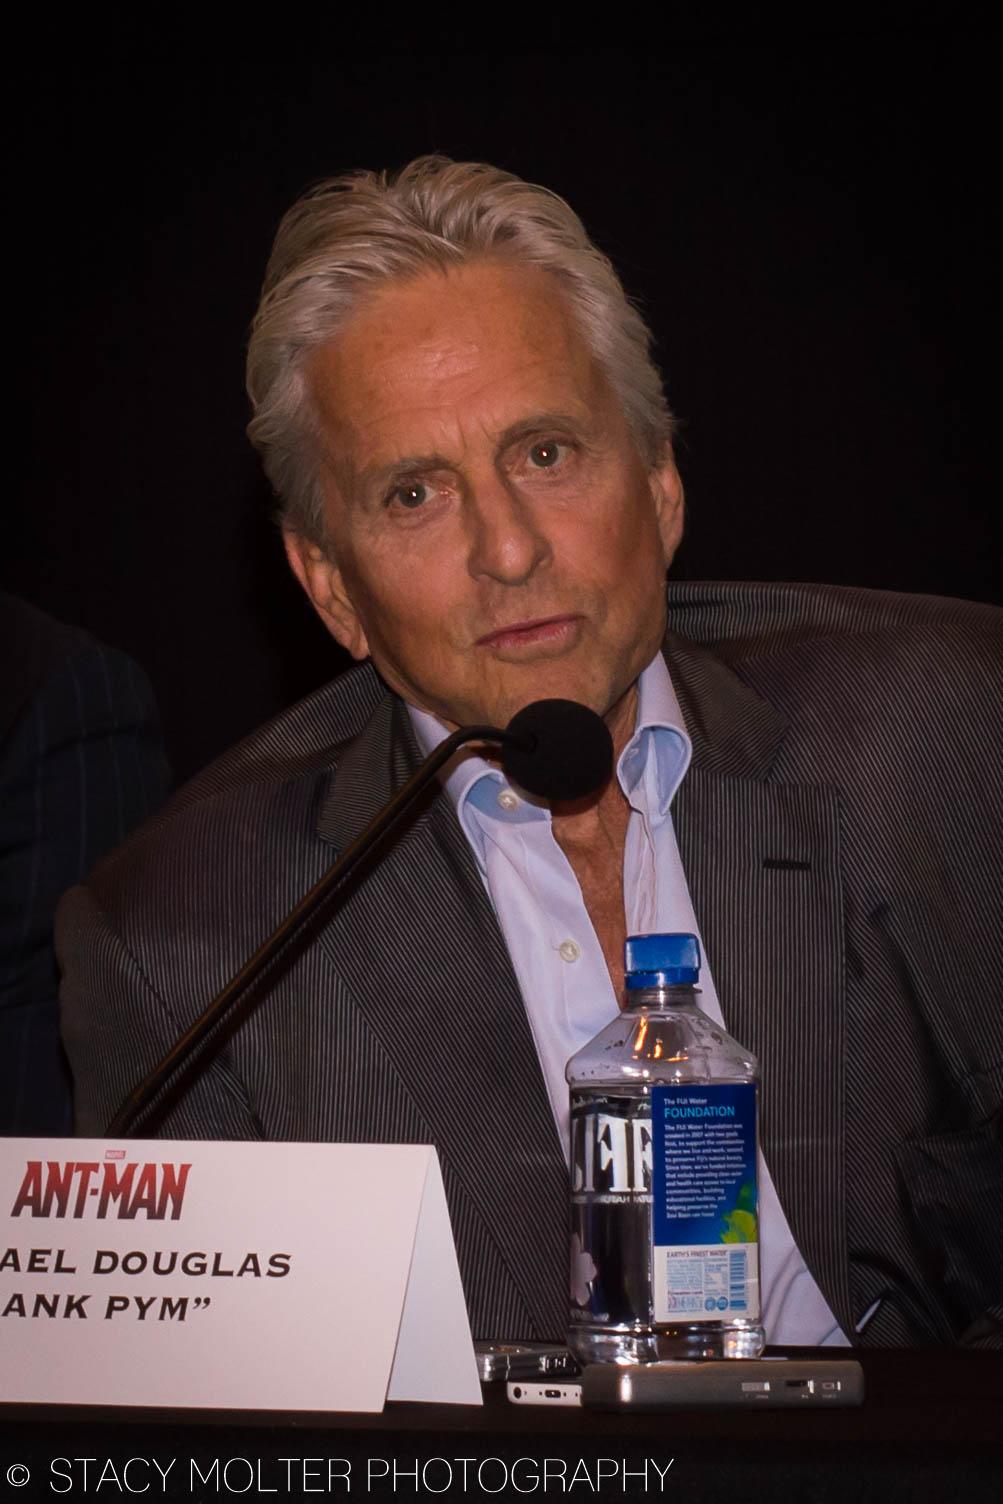 Michael Douglas - Ant-Man Press Conference